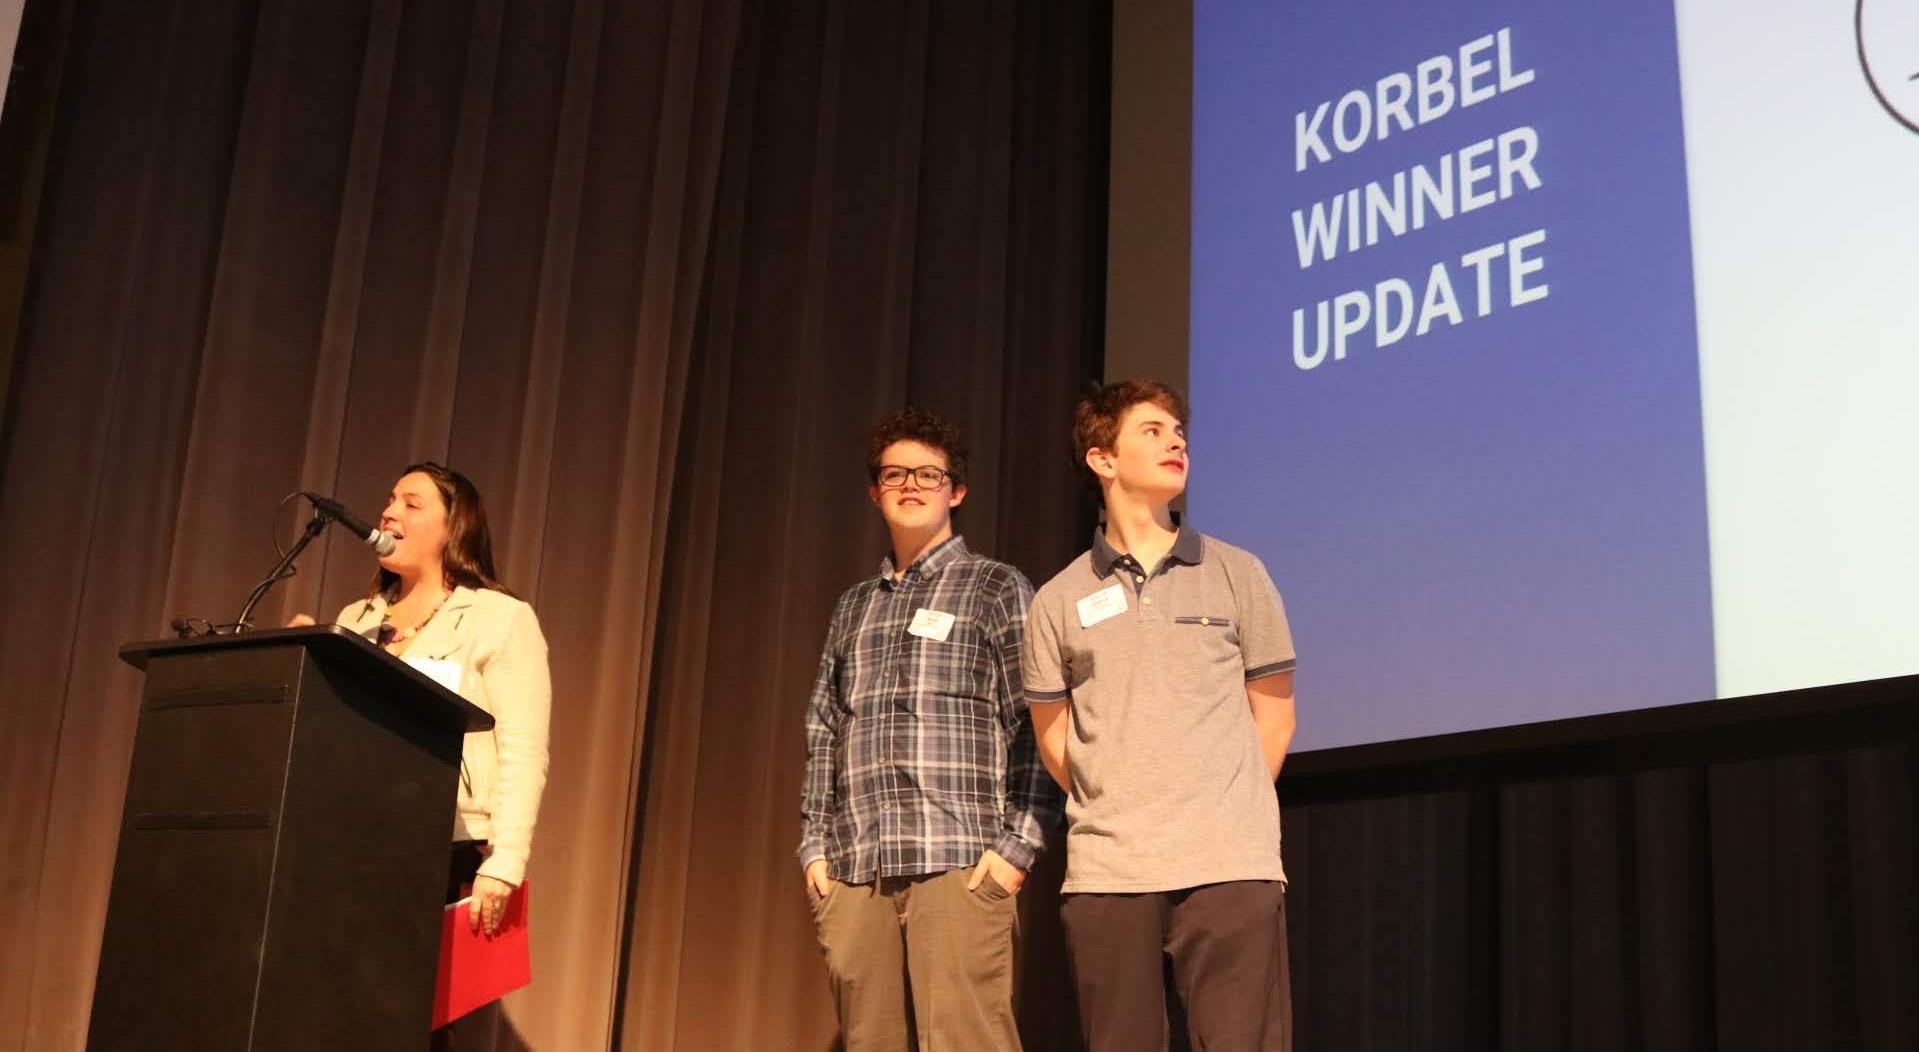 WAC Program Director, Hope Mukai and 2018 WAC winners from Mackintosh Academy, showcasing their project updates.